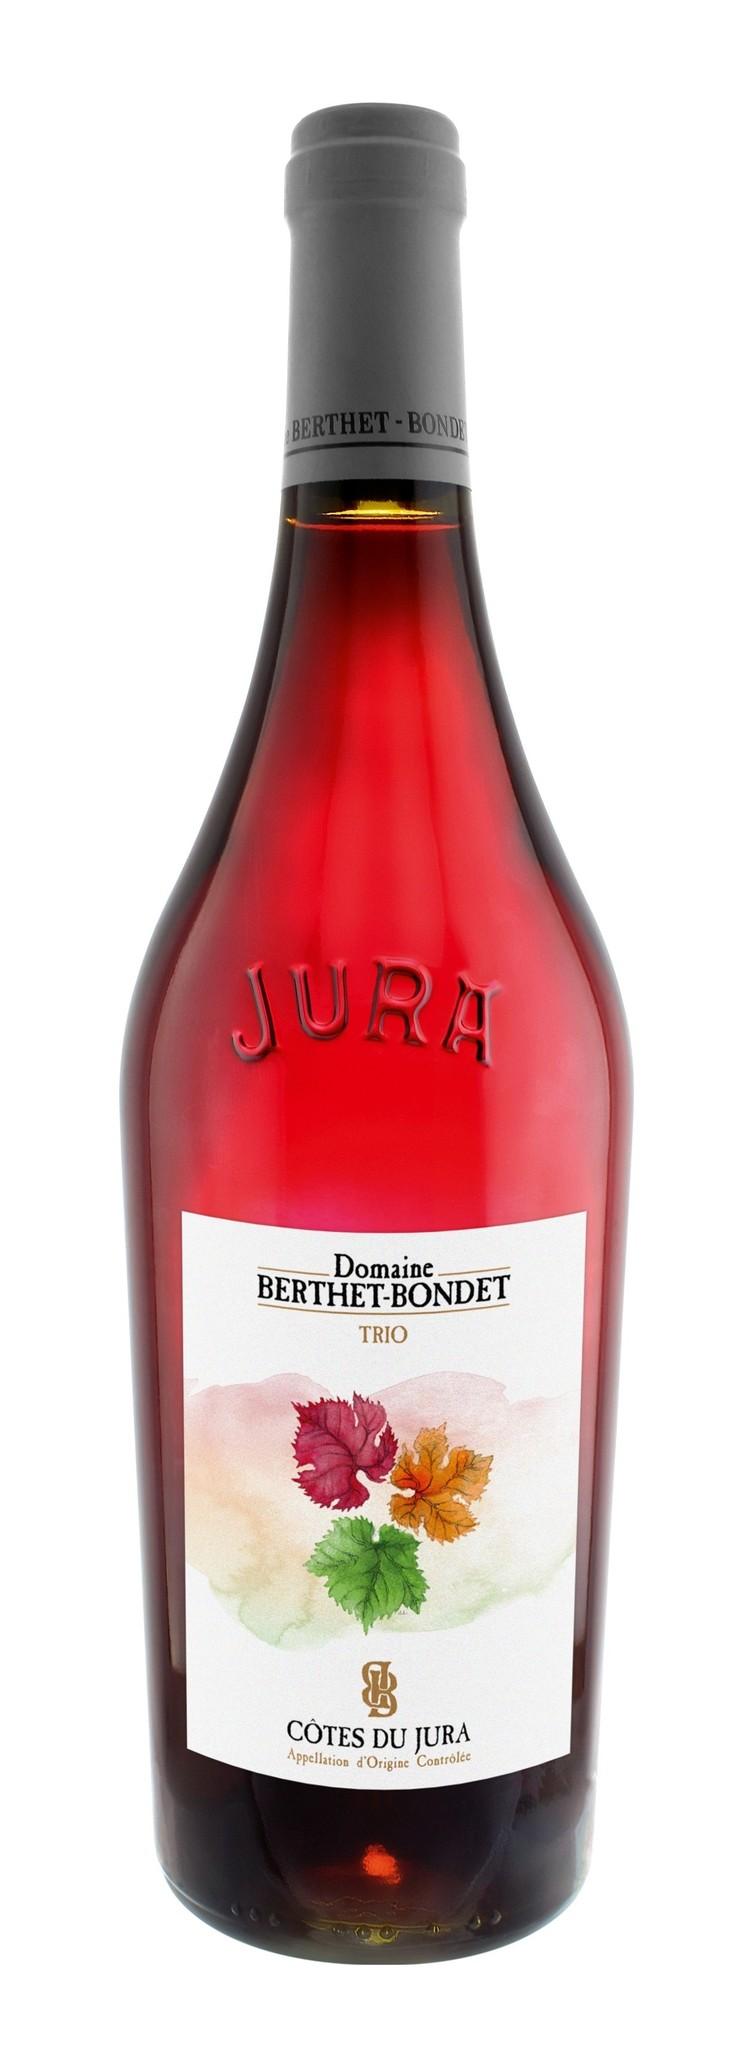 Berthet-Bondet - Jura 2019 Côtes du Jura TRIO, Domaine Berthet-Bondet